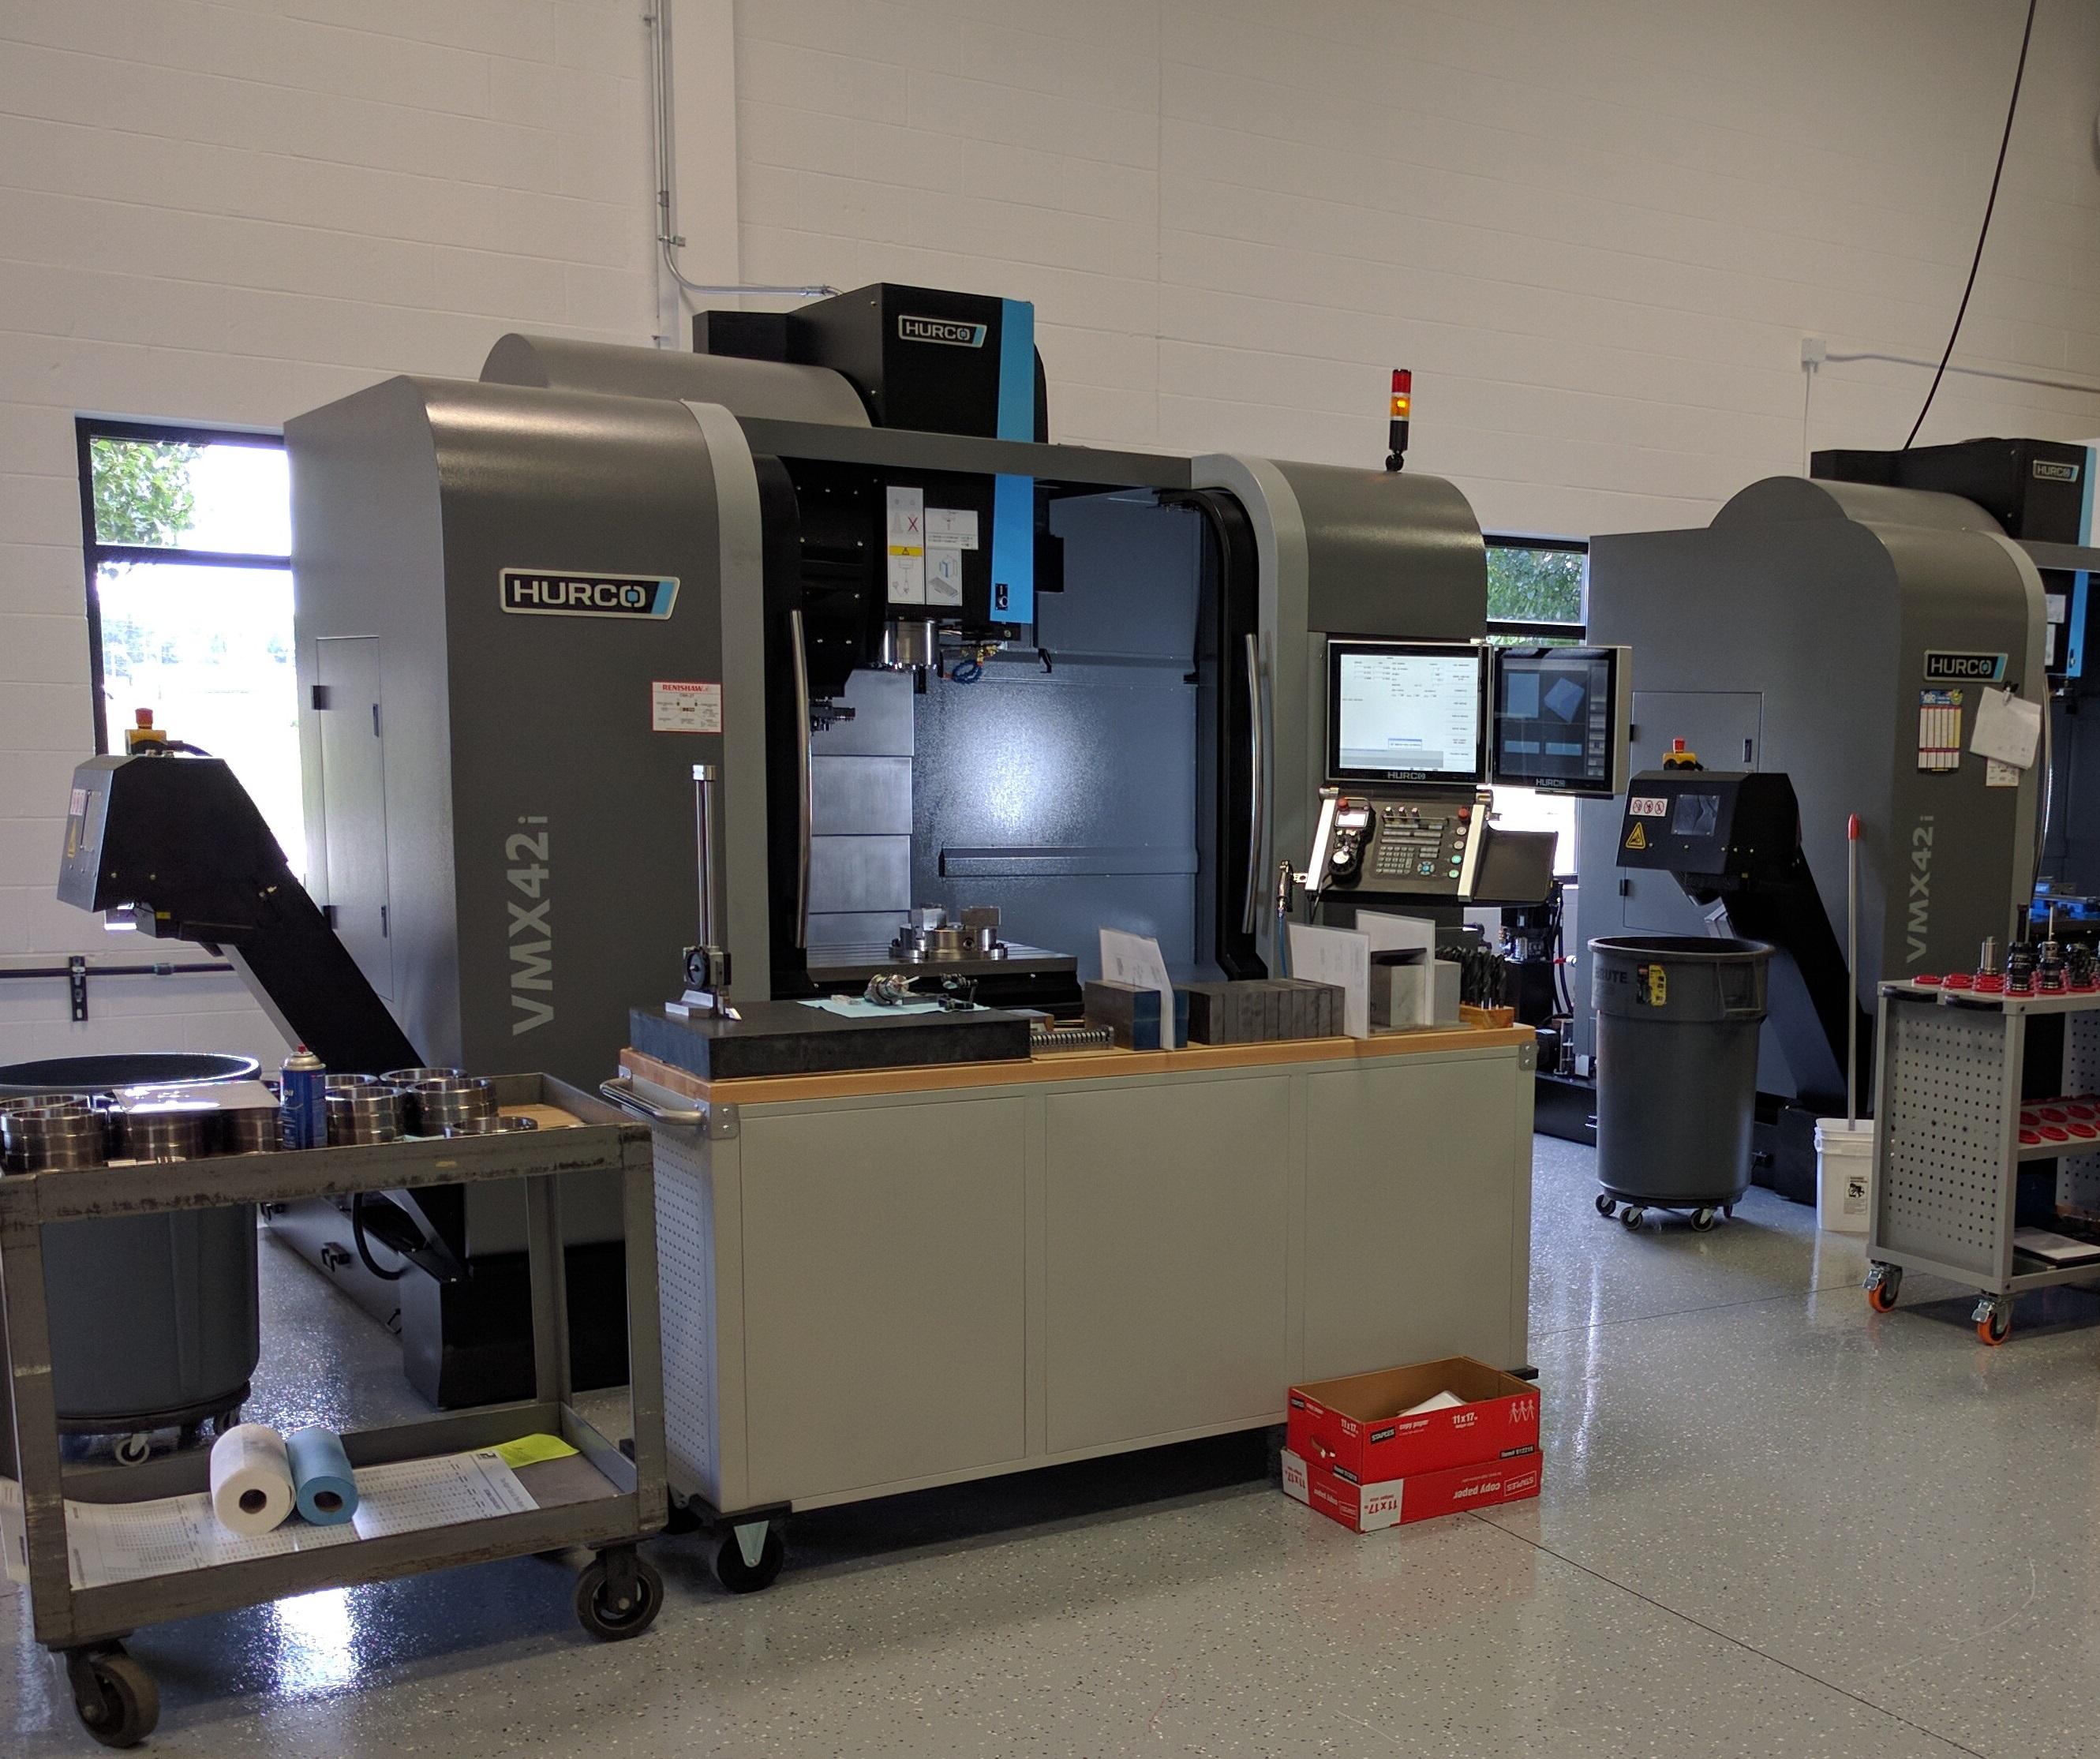 5 Axis Cnc Machining Sdk Technologies Inc 16001 Leone Dr Macomb